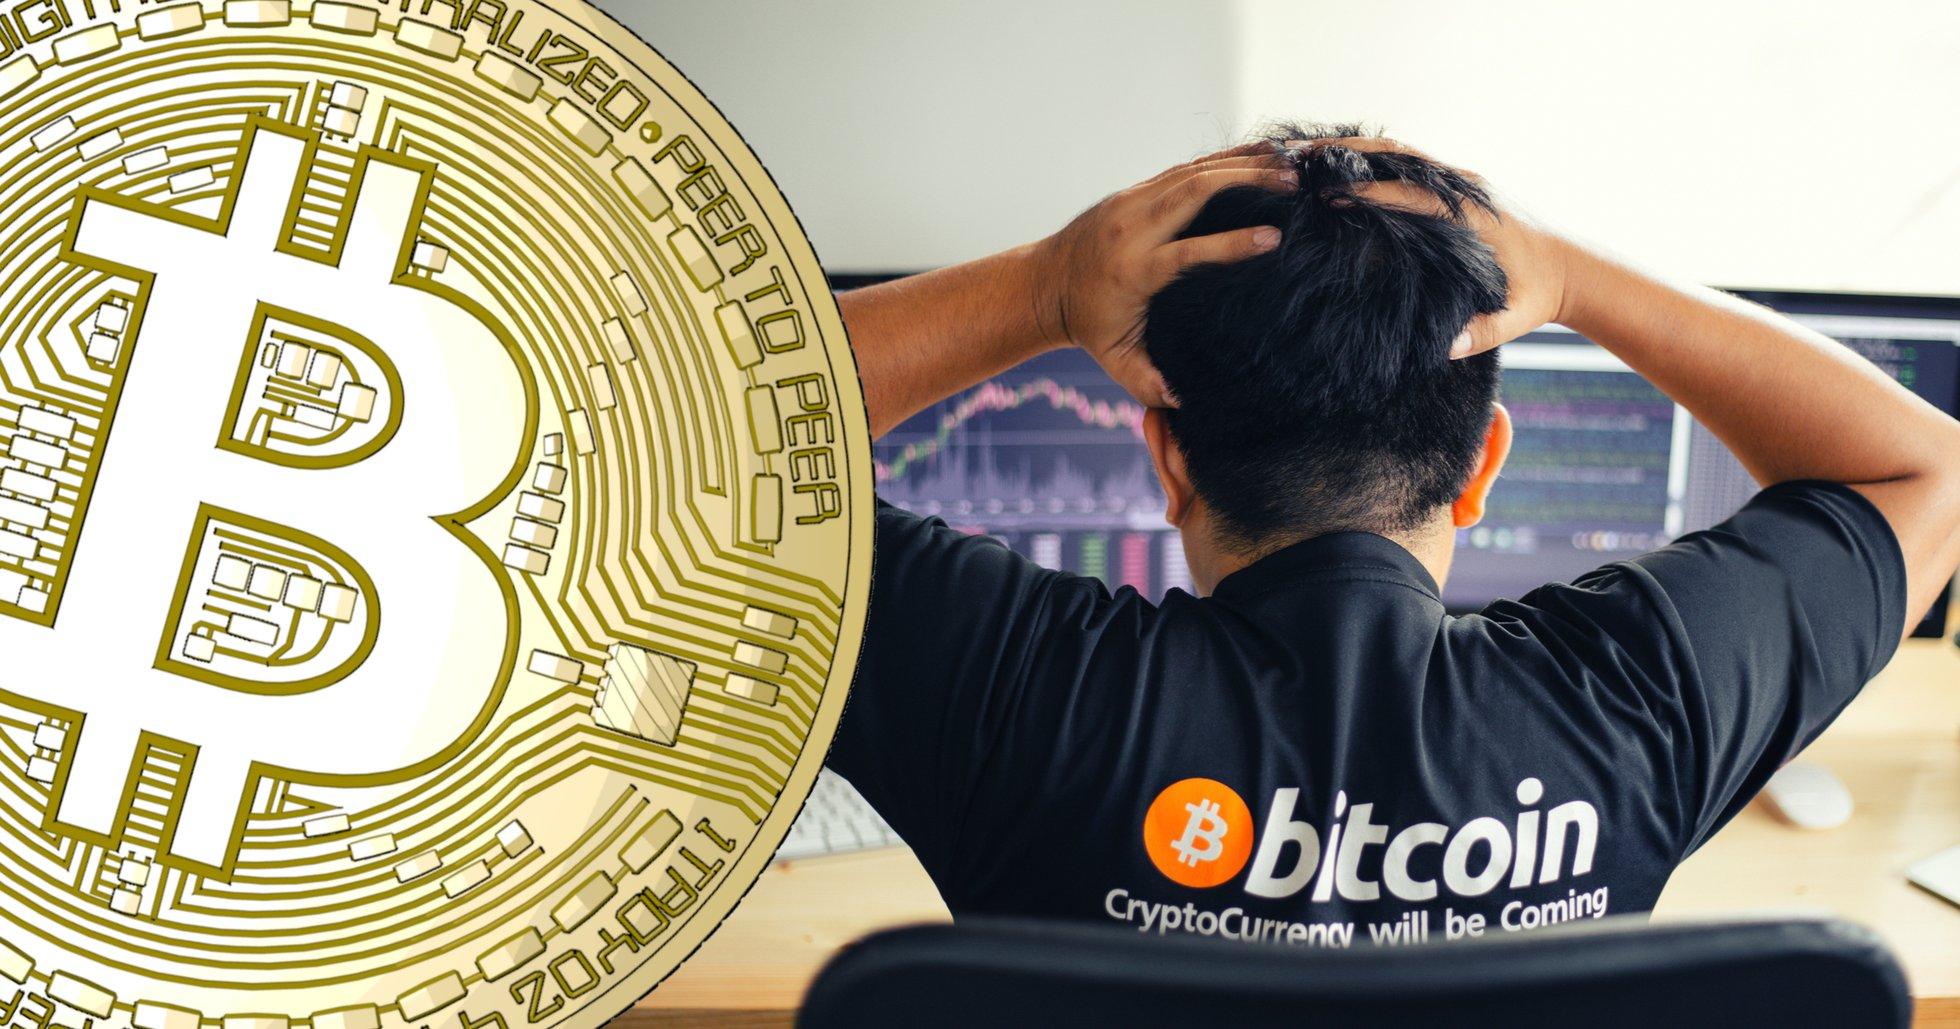 Bitcoinpriset åter under 7 000 dollar.